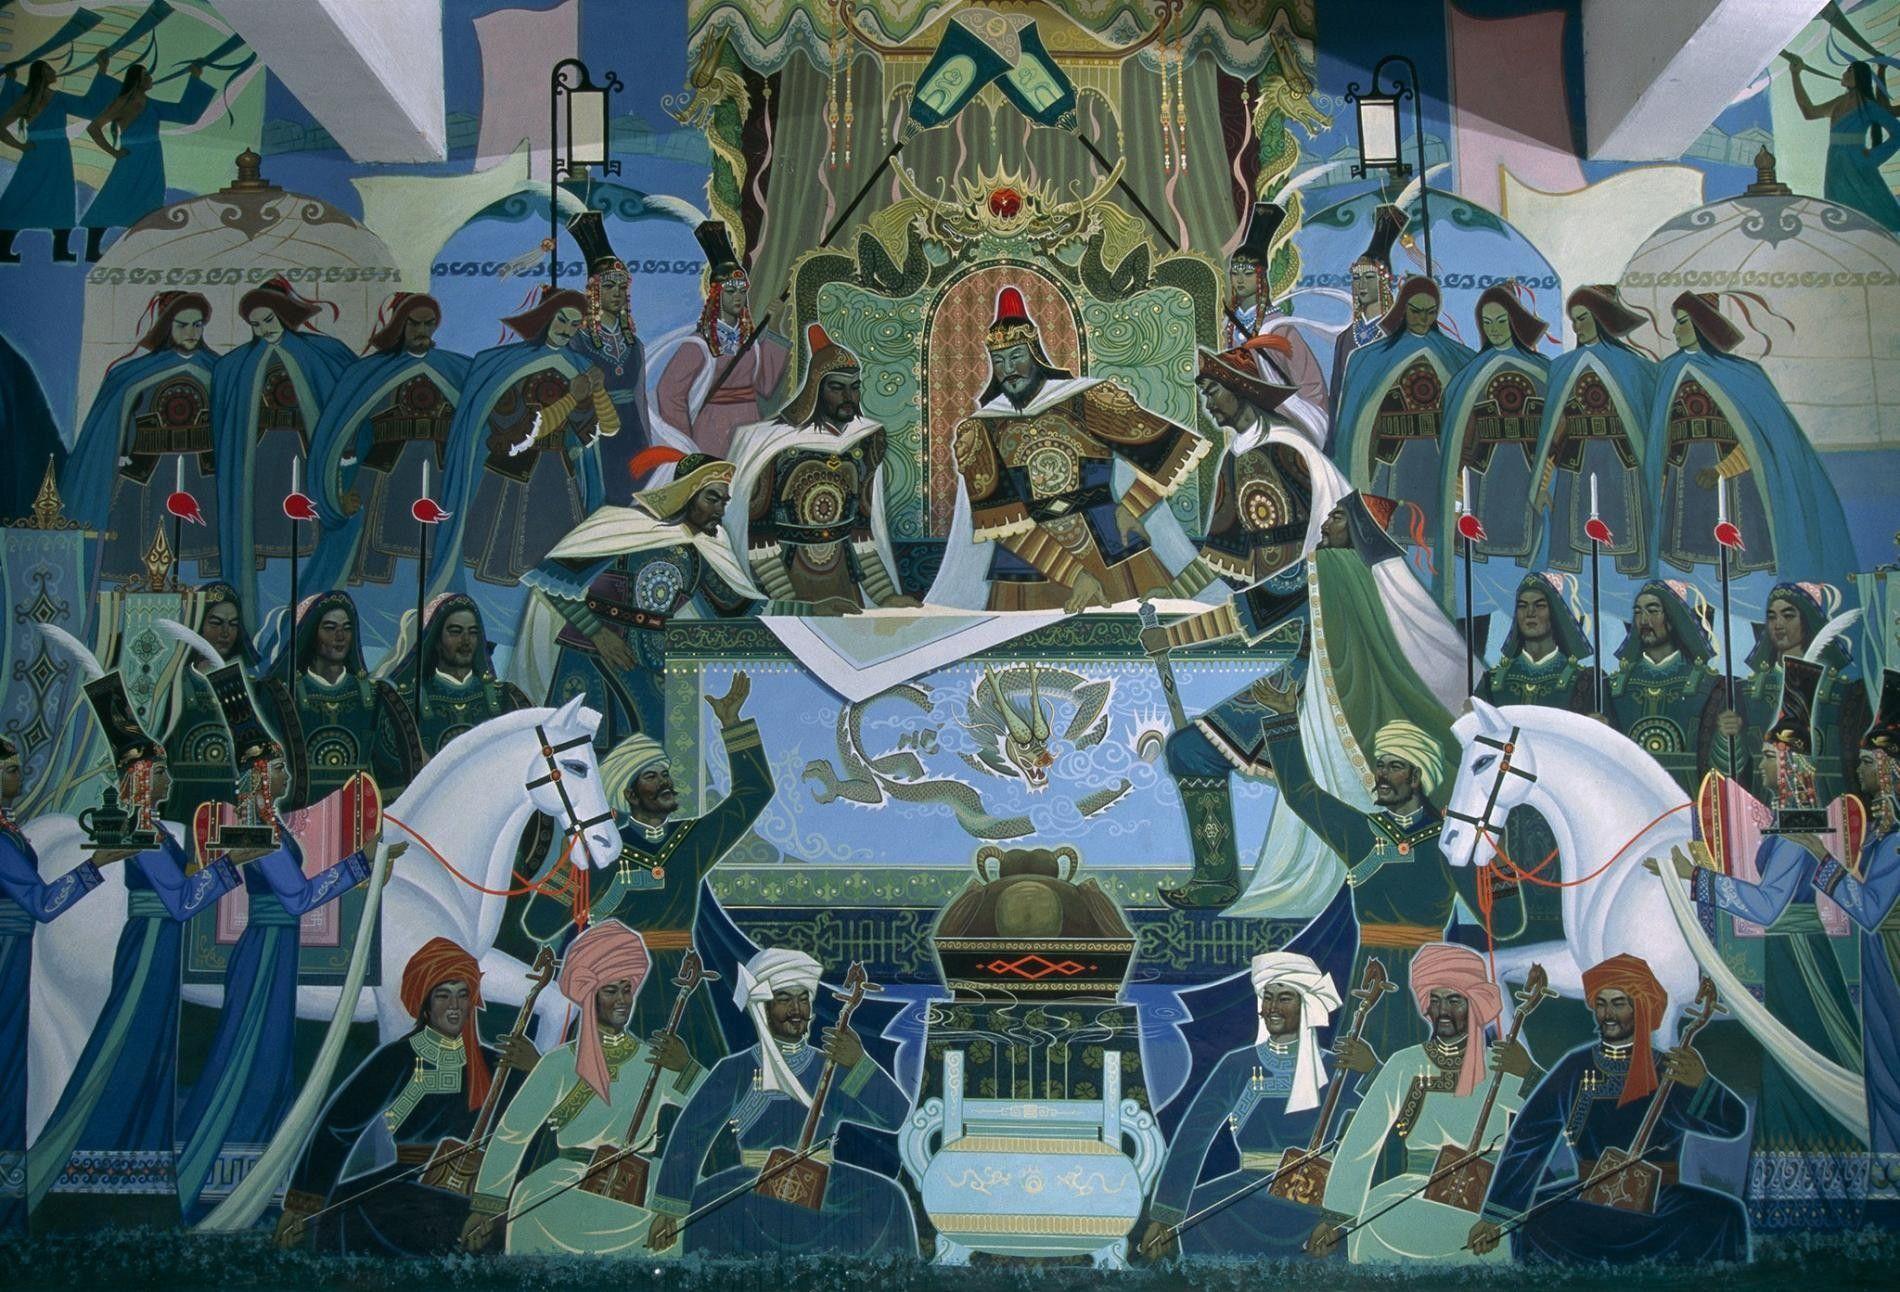 Wandbild: Krönung von Dschingis Khan